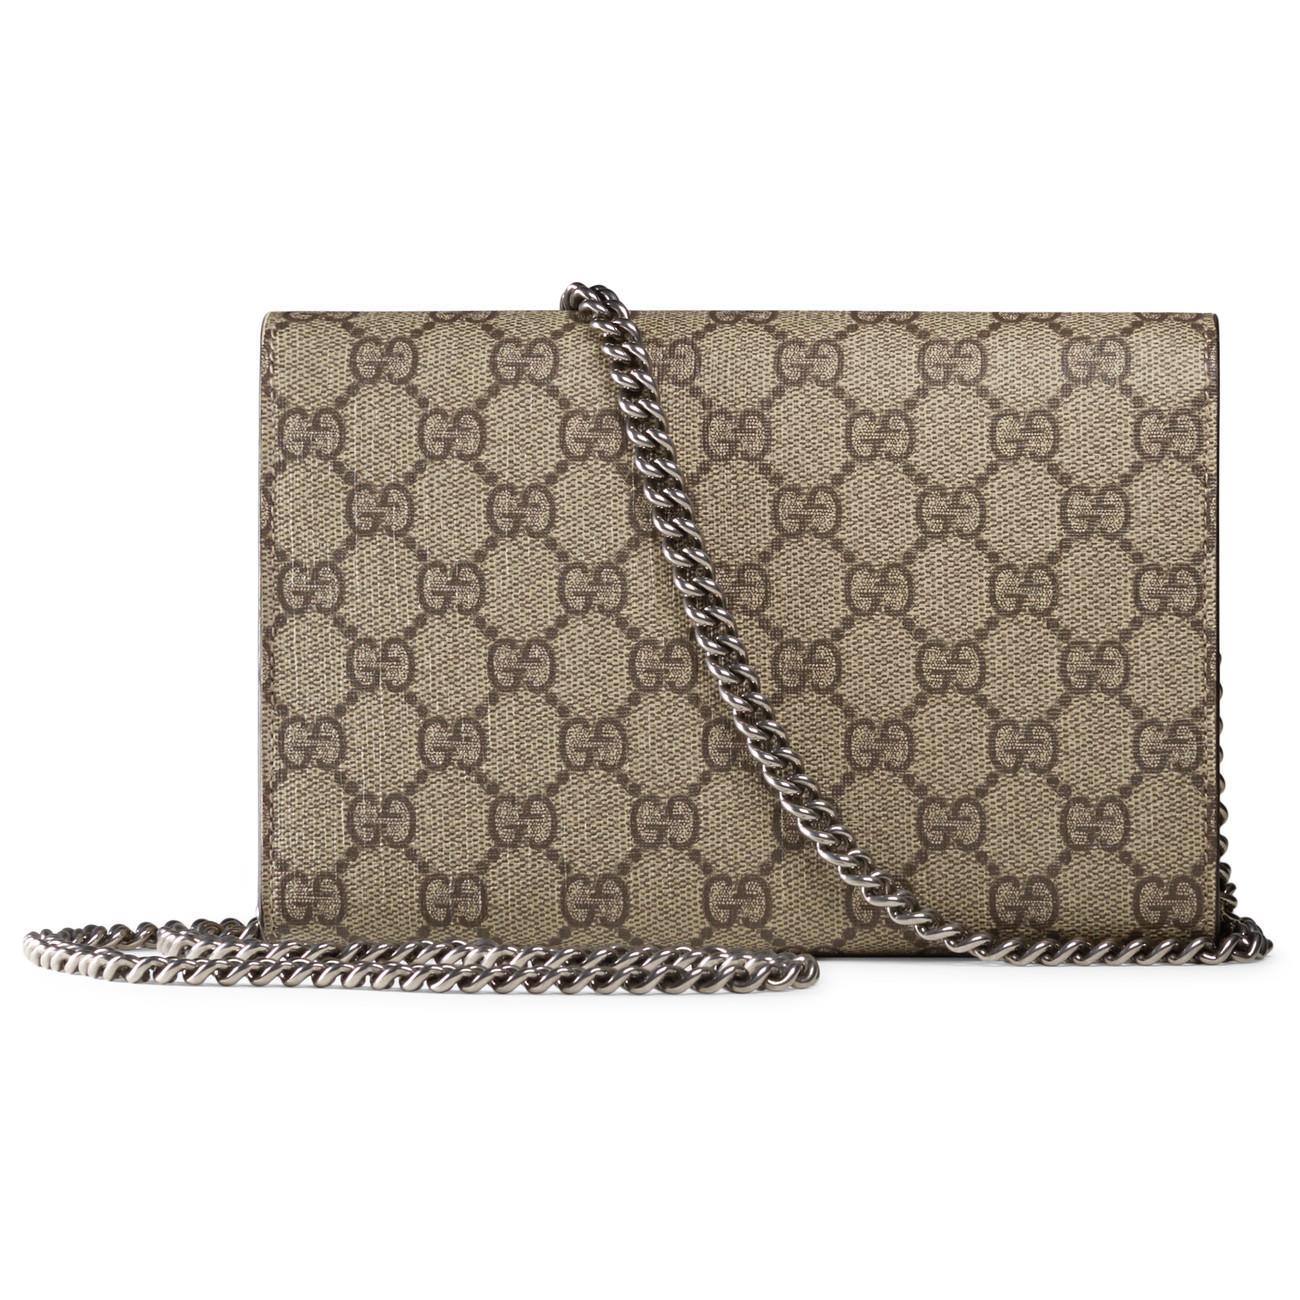 b692756c6c73 Gucci Dionysus GG Supreme Chain Shoulder Bag - Lyst